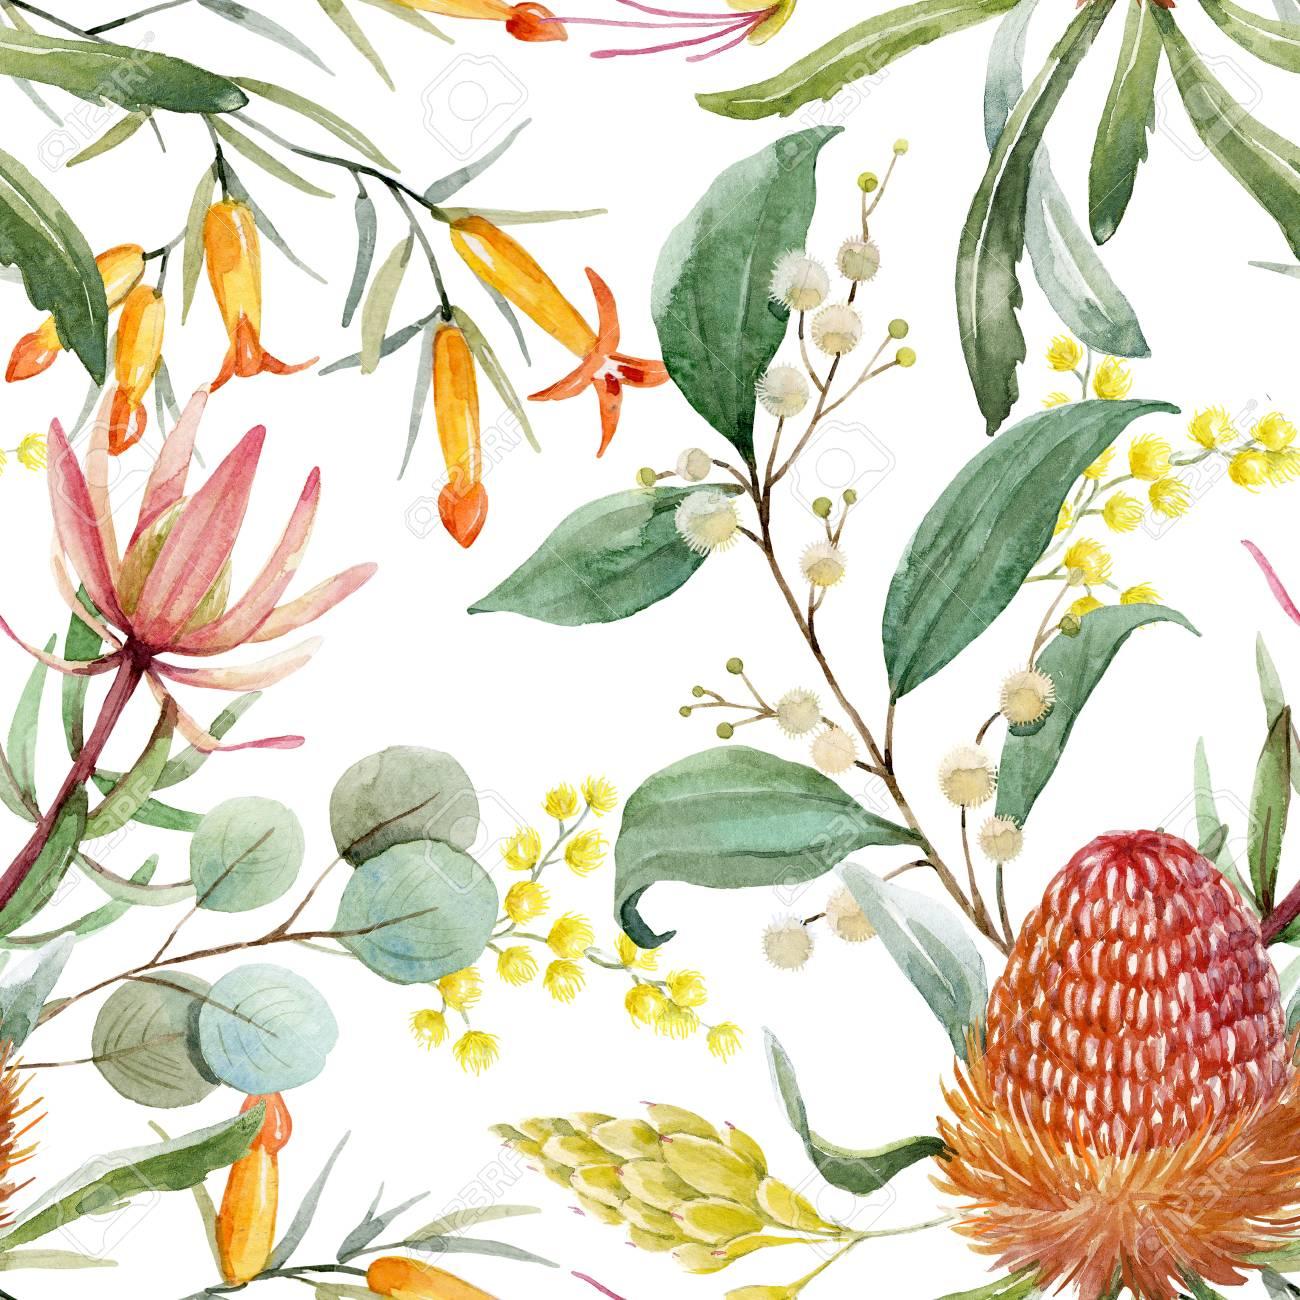 Watercolor australian banksia floral pattern - 100986676